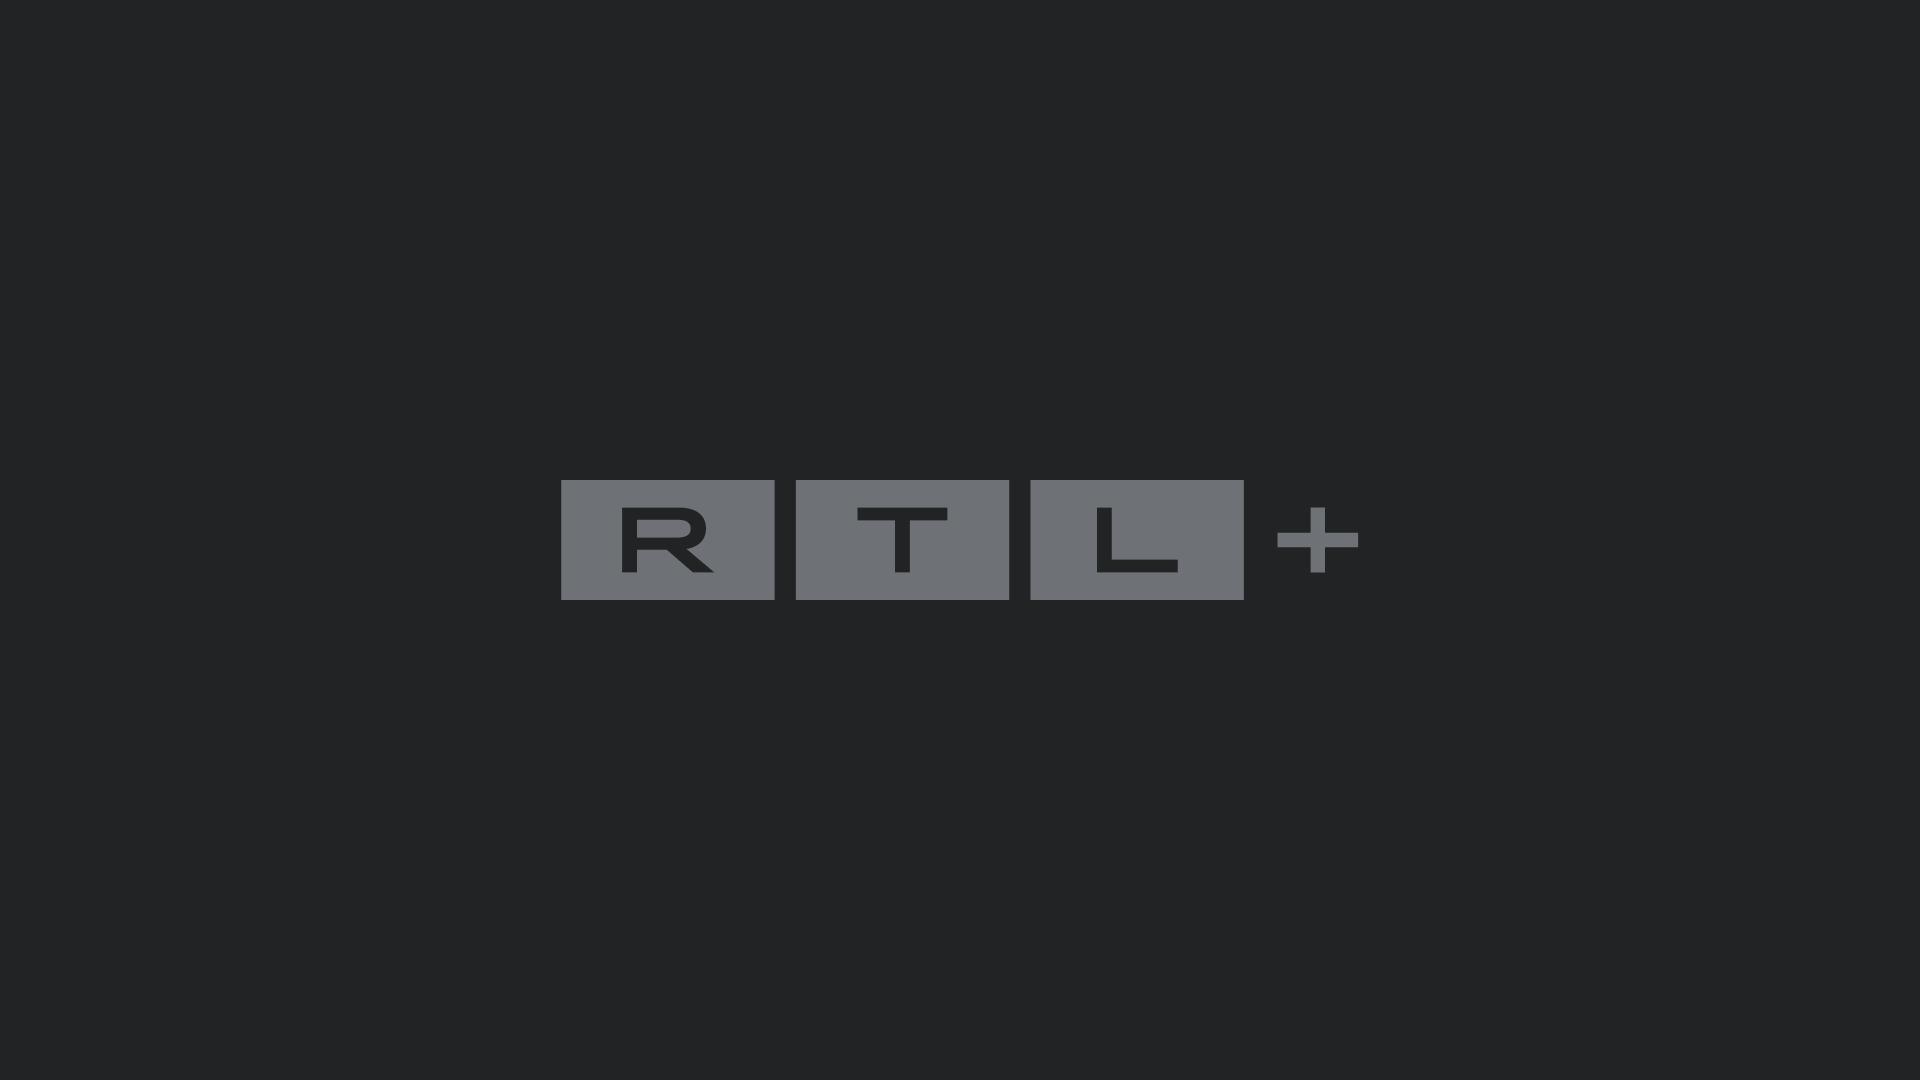 Action - Die rasantesten Stunts aller Zeiten